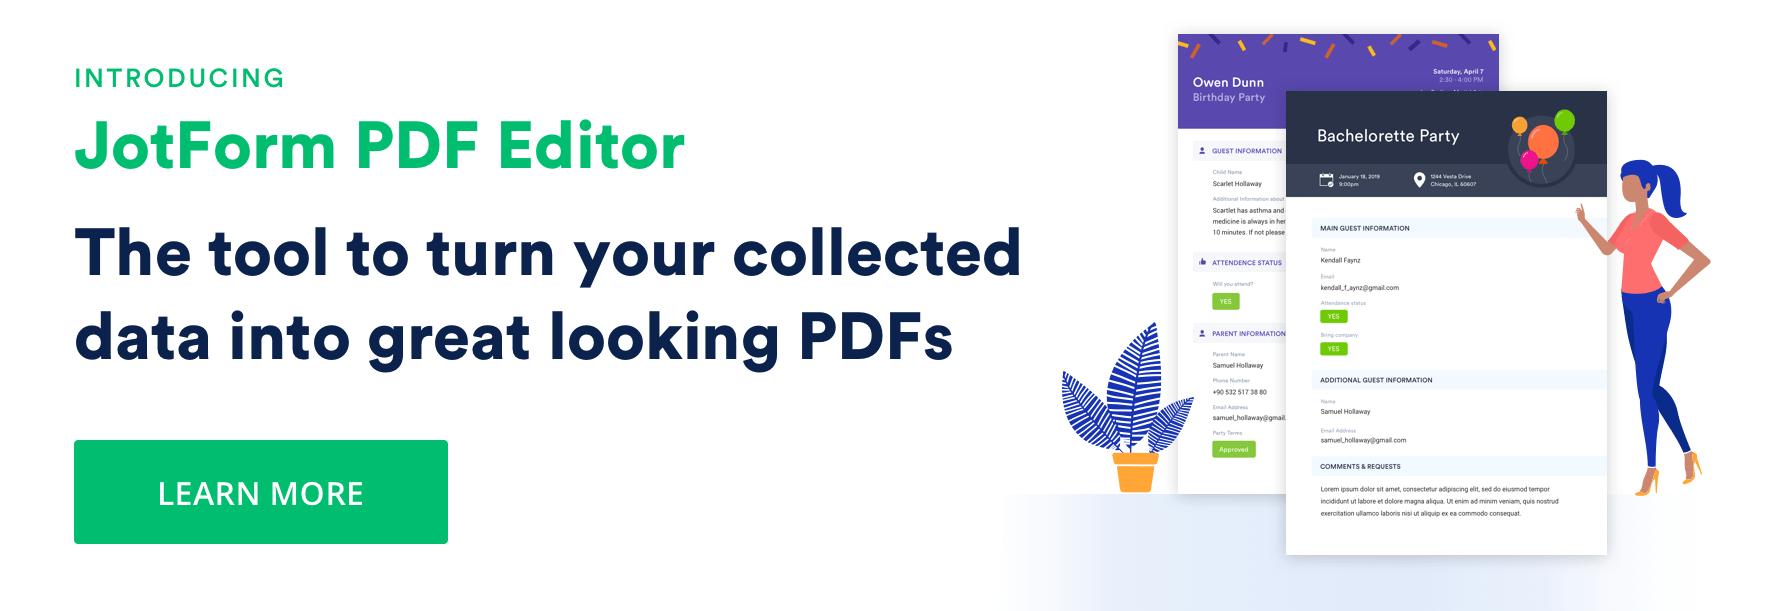 hight resolution of jotform pdf editor